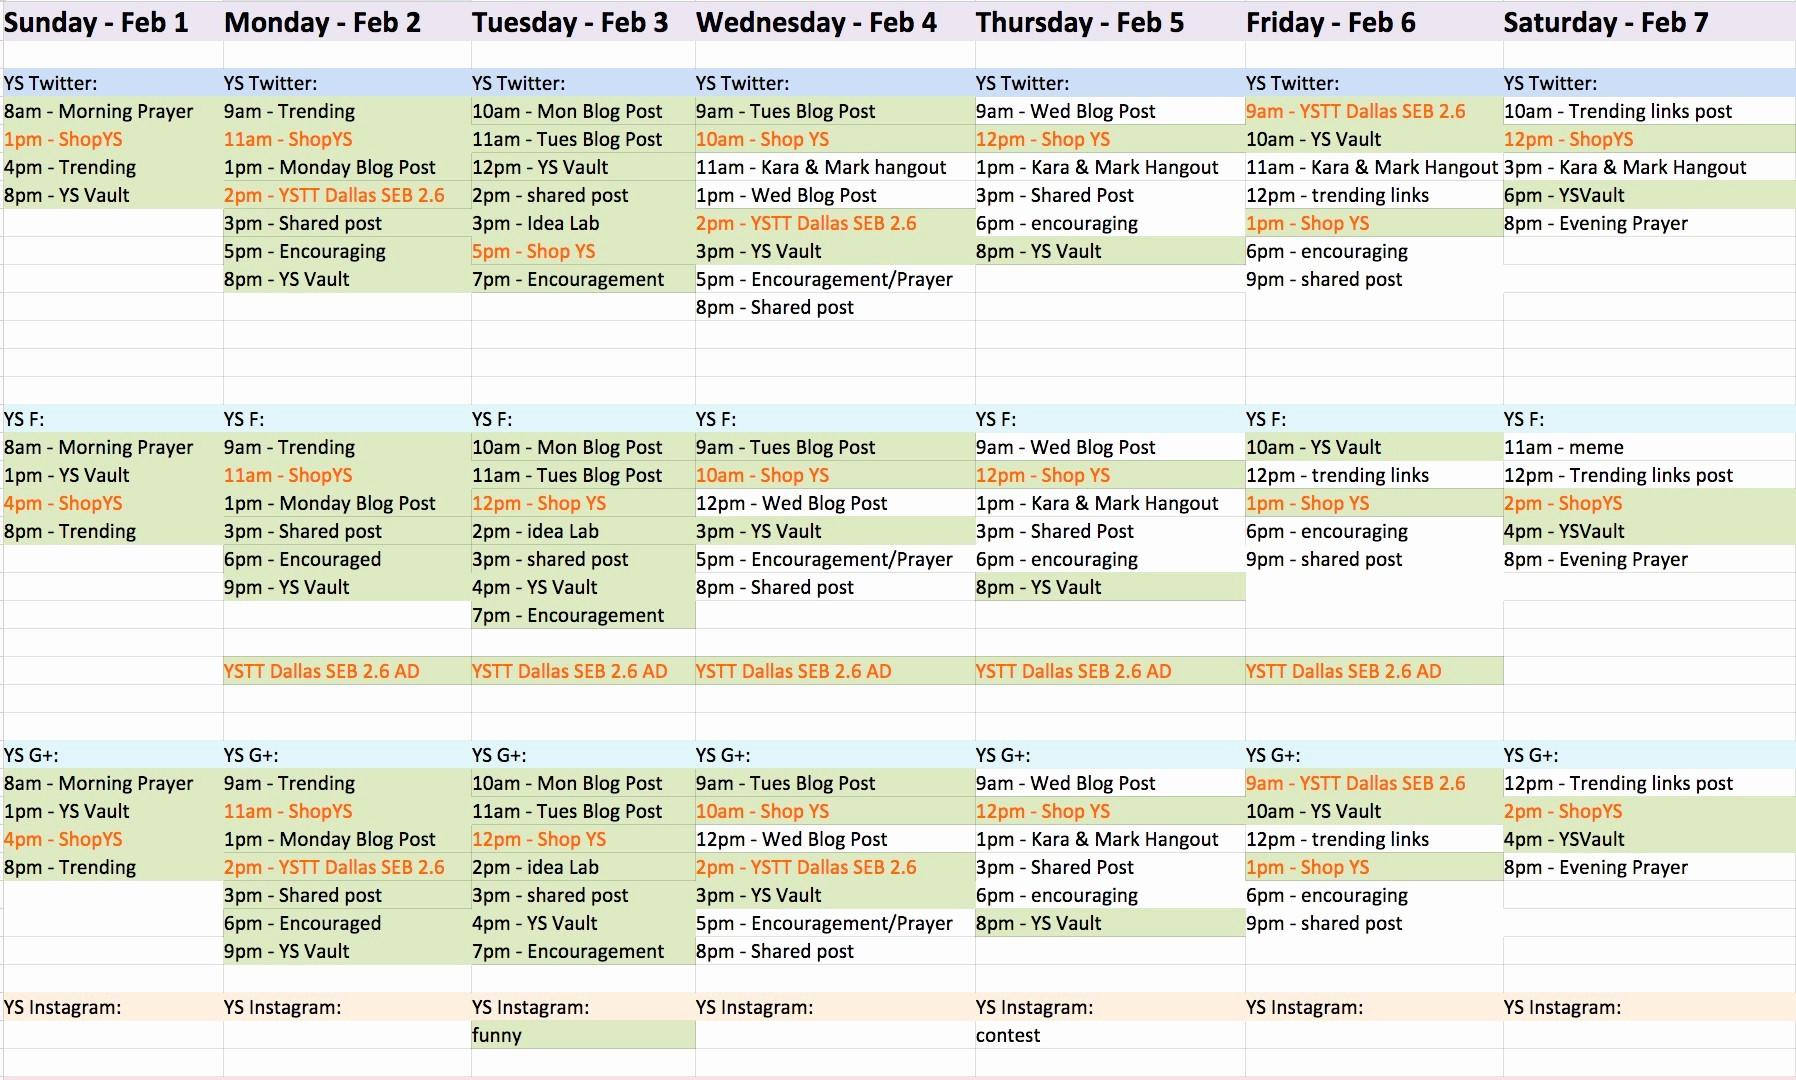 College Schedule Template Google Docs Fresh social Media Content Calendar Template Google Docs 2018